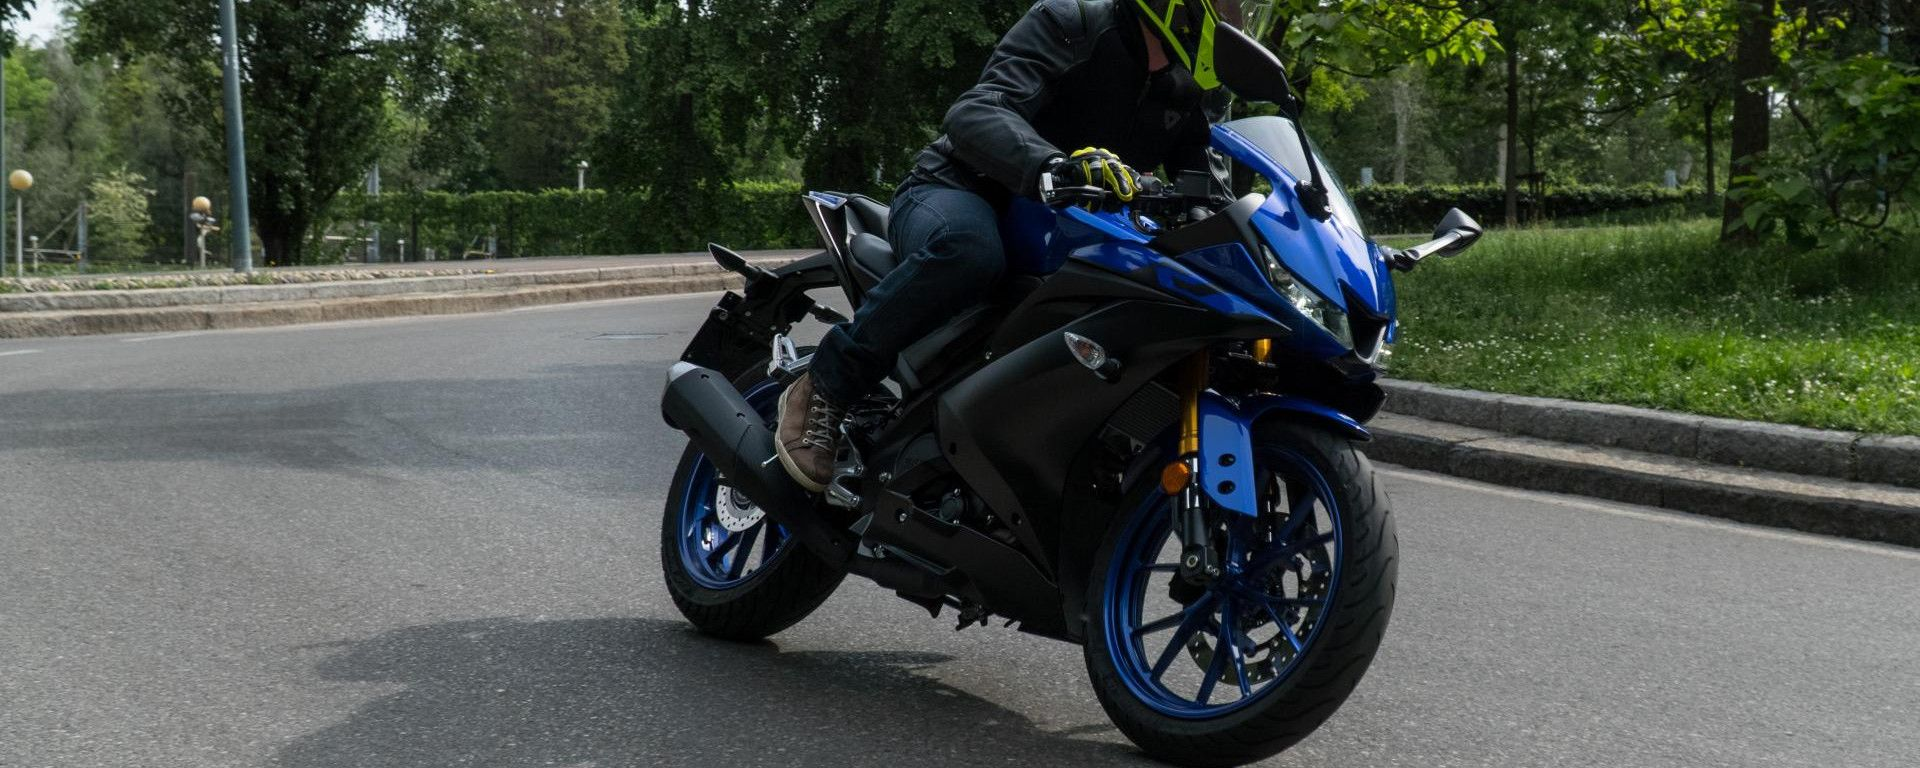 Guida all'acquisto moto 125: naked, motard e sportive